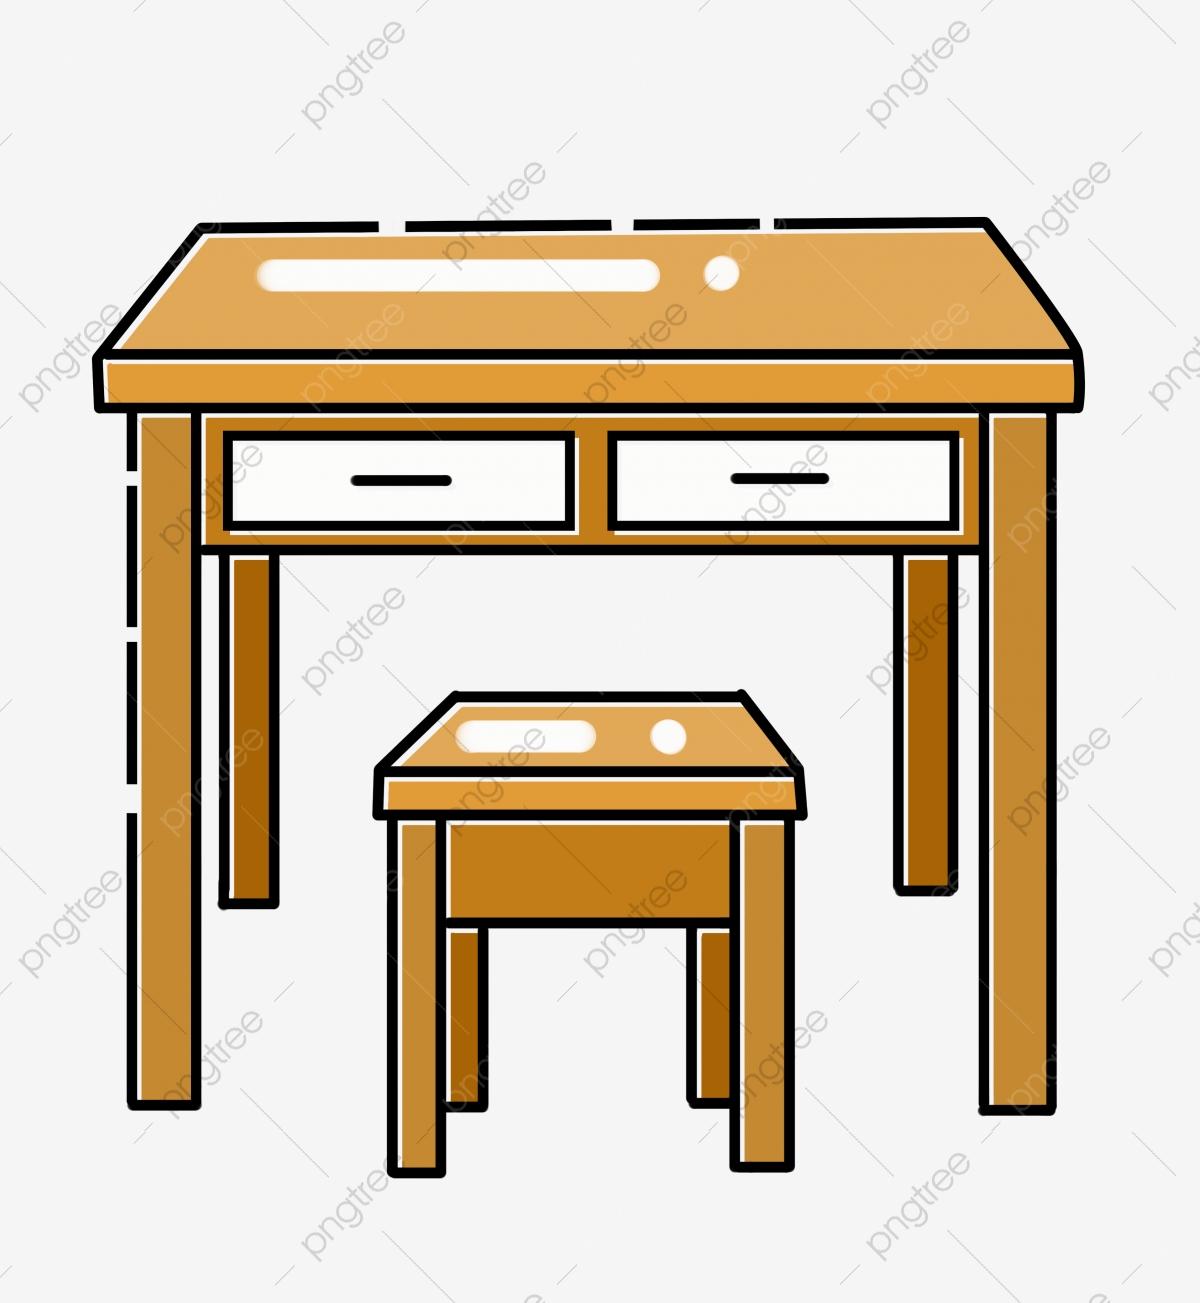 Small objects hot summer. Desk clipart cute desk